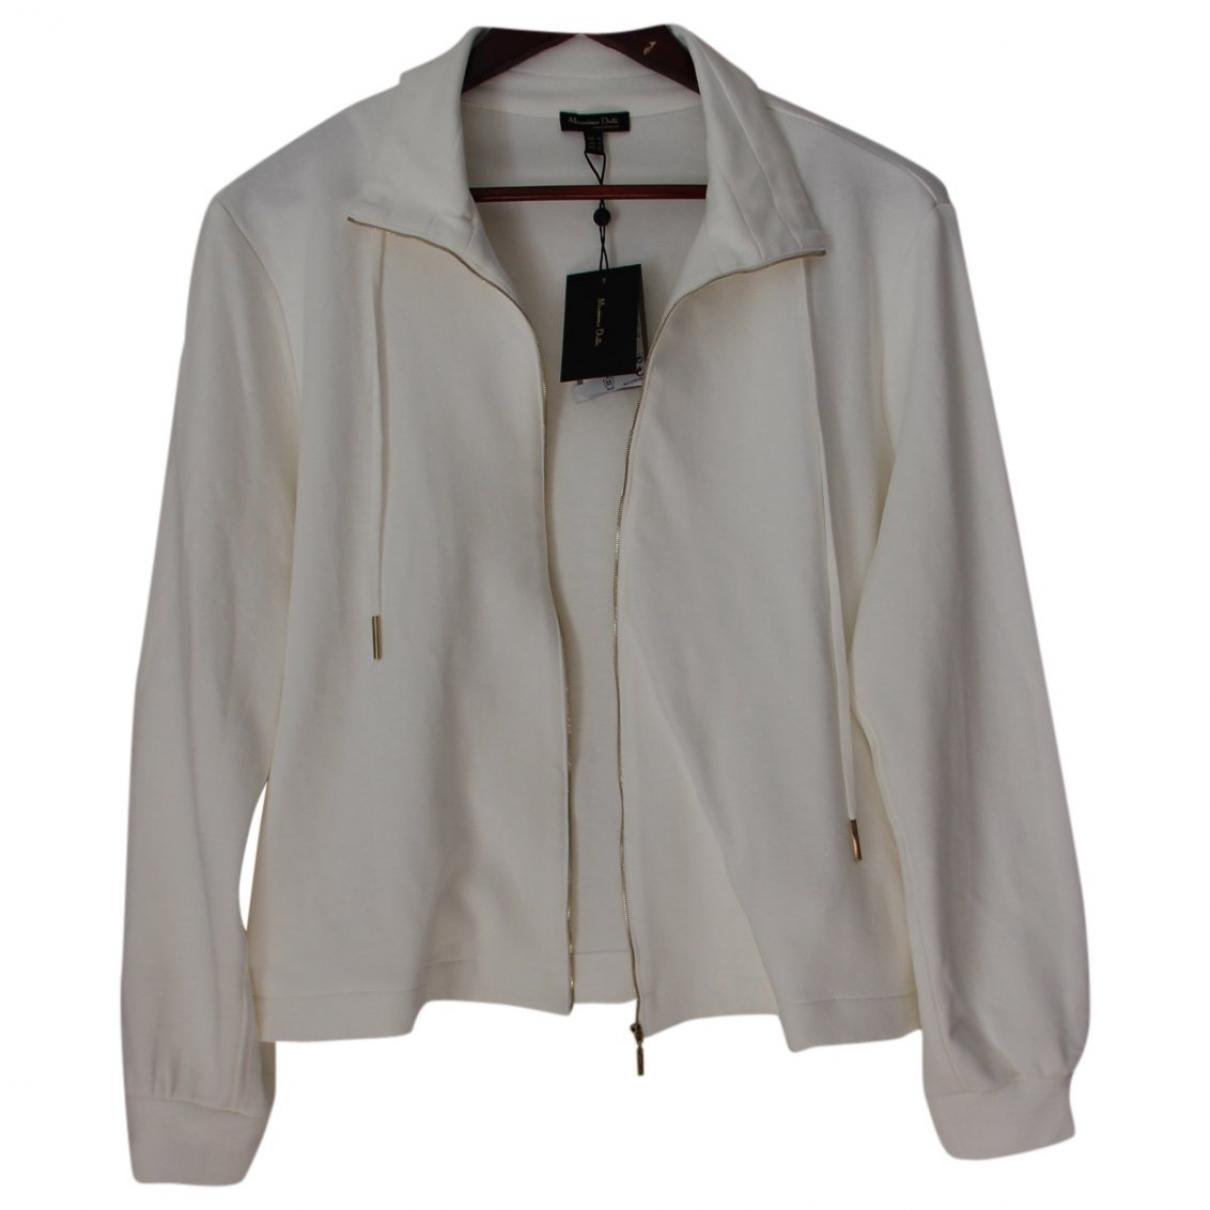 Massimo Dutti \N White Cotton jacket for Women M International